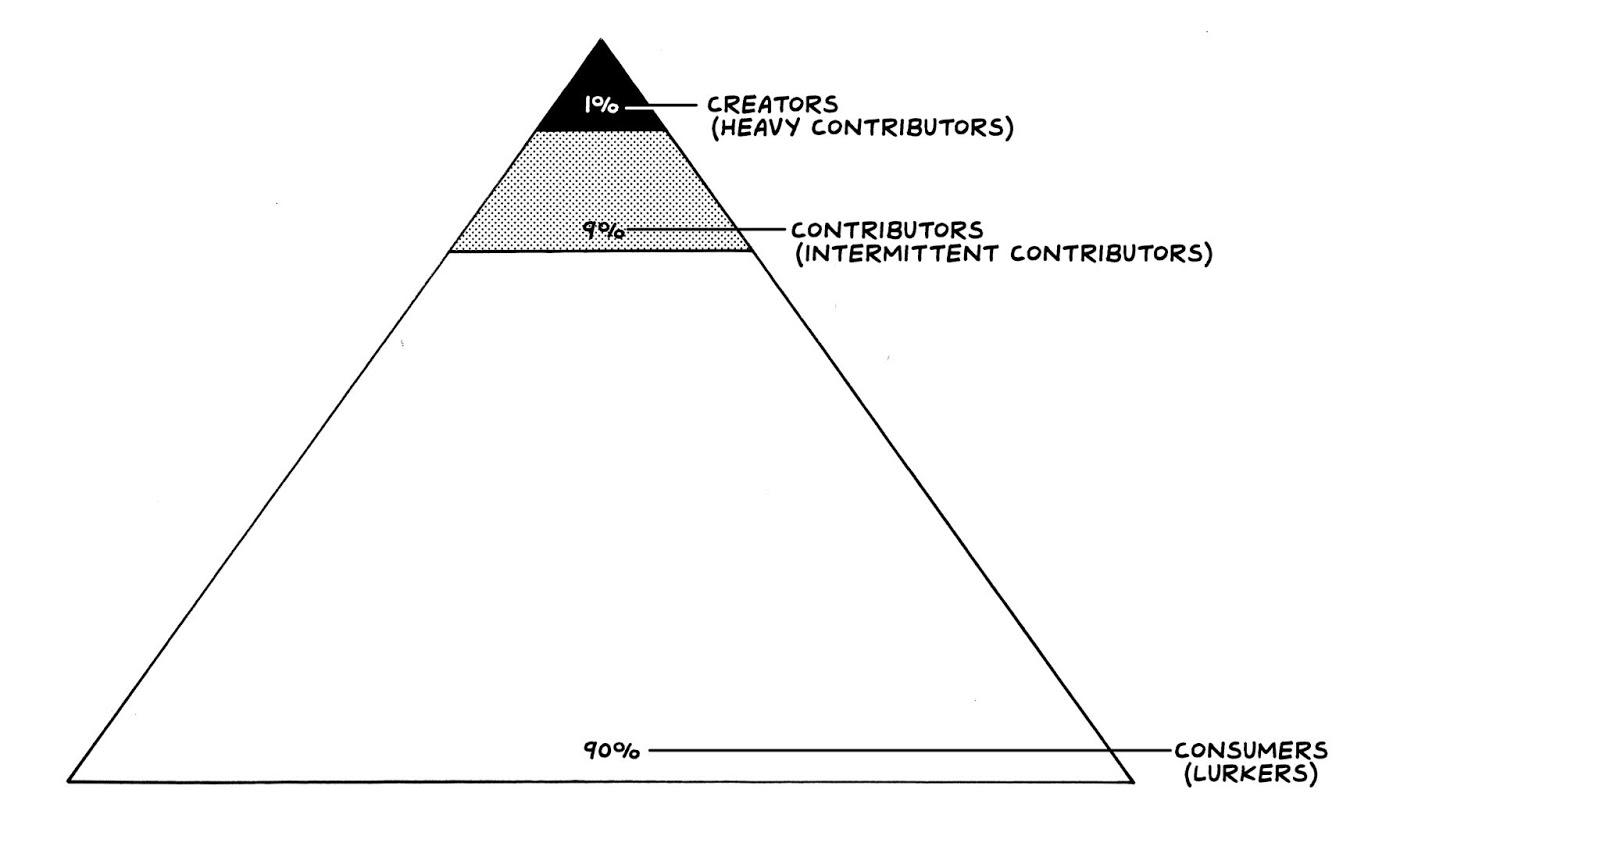 triangle diagram broken into 90% consumers, 9% contributors, 1% creators